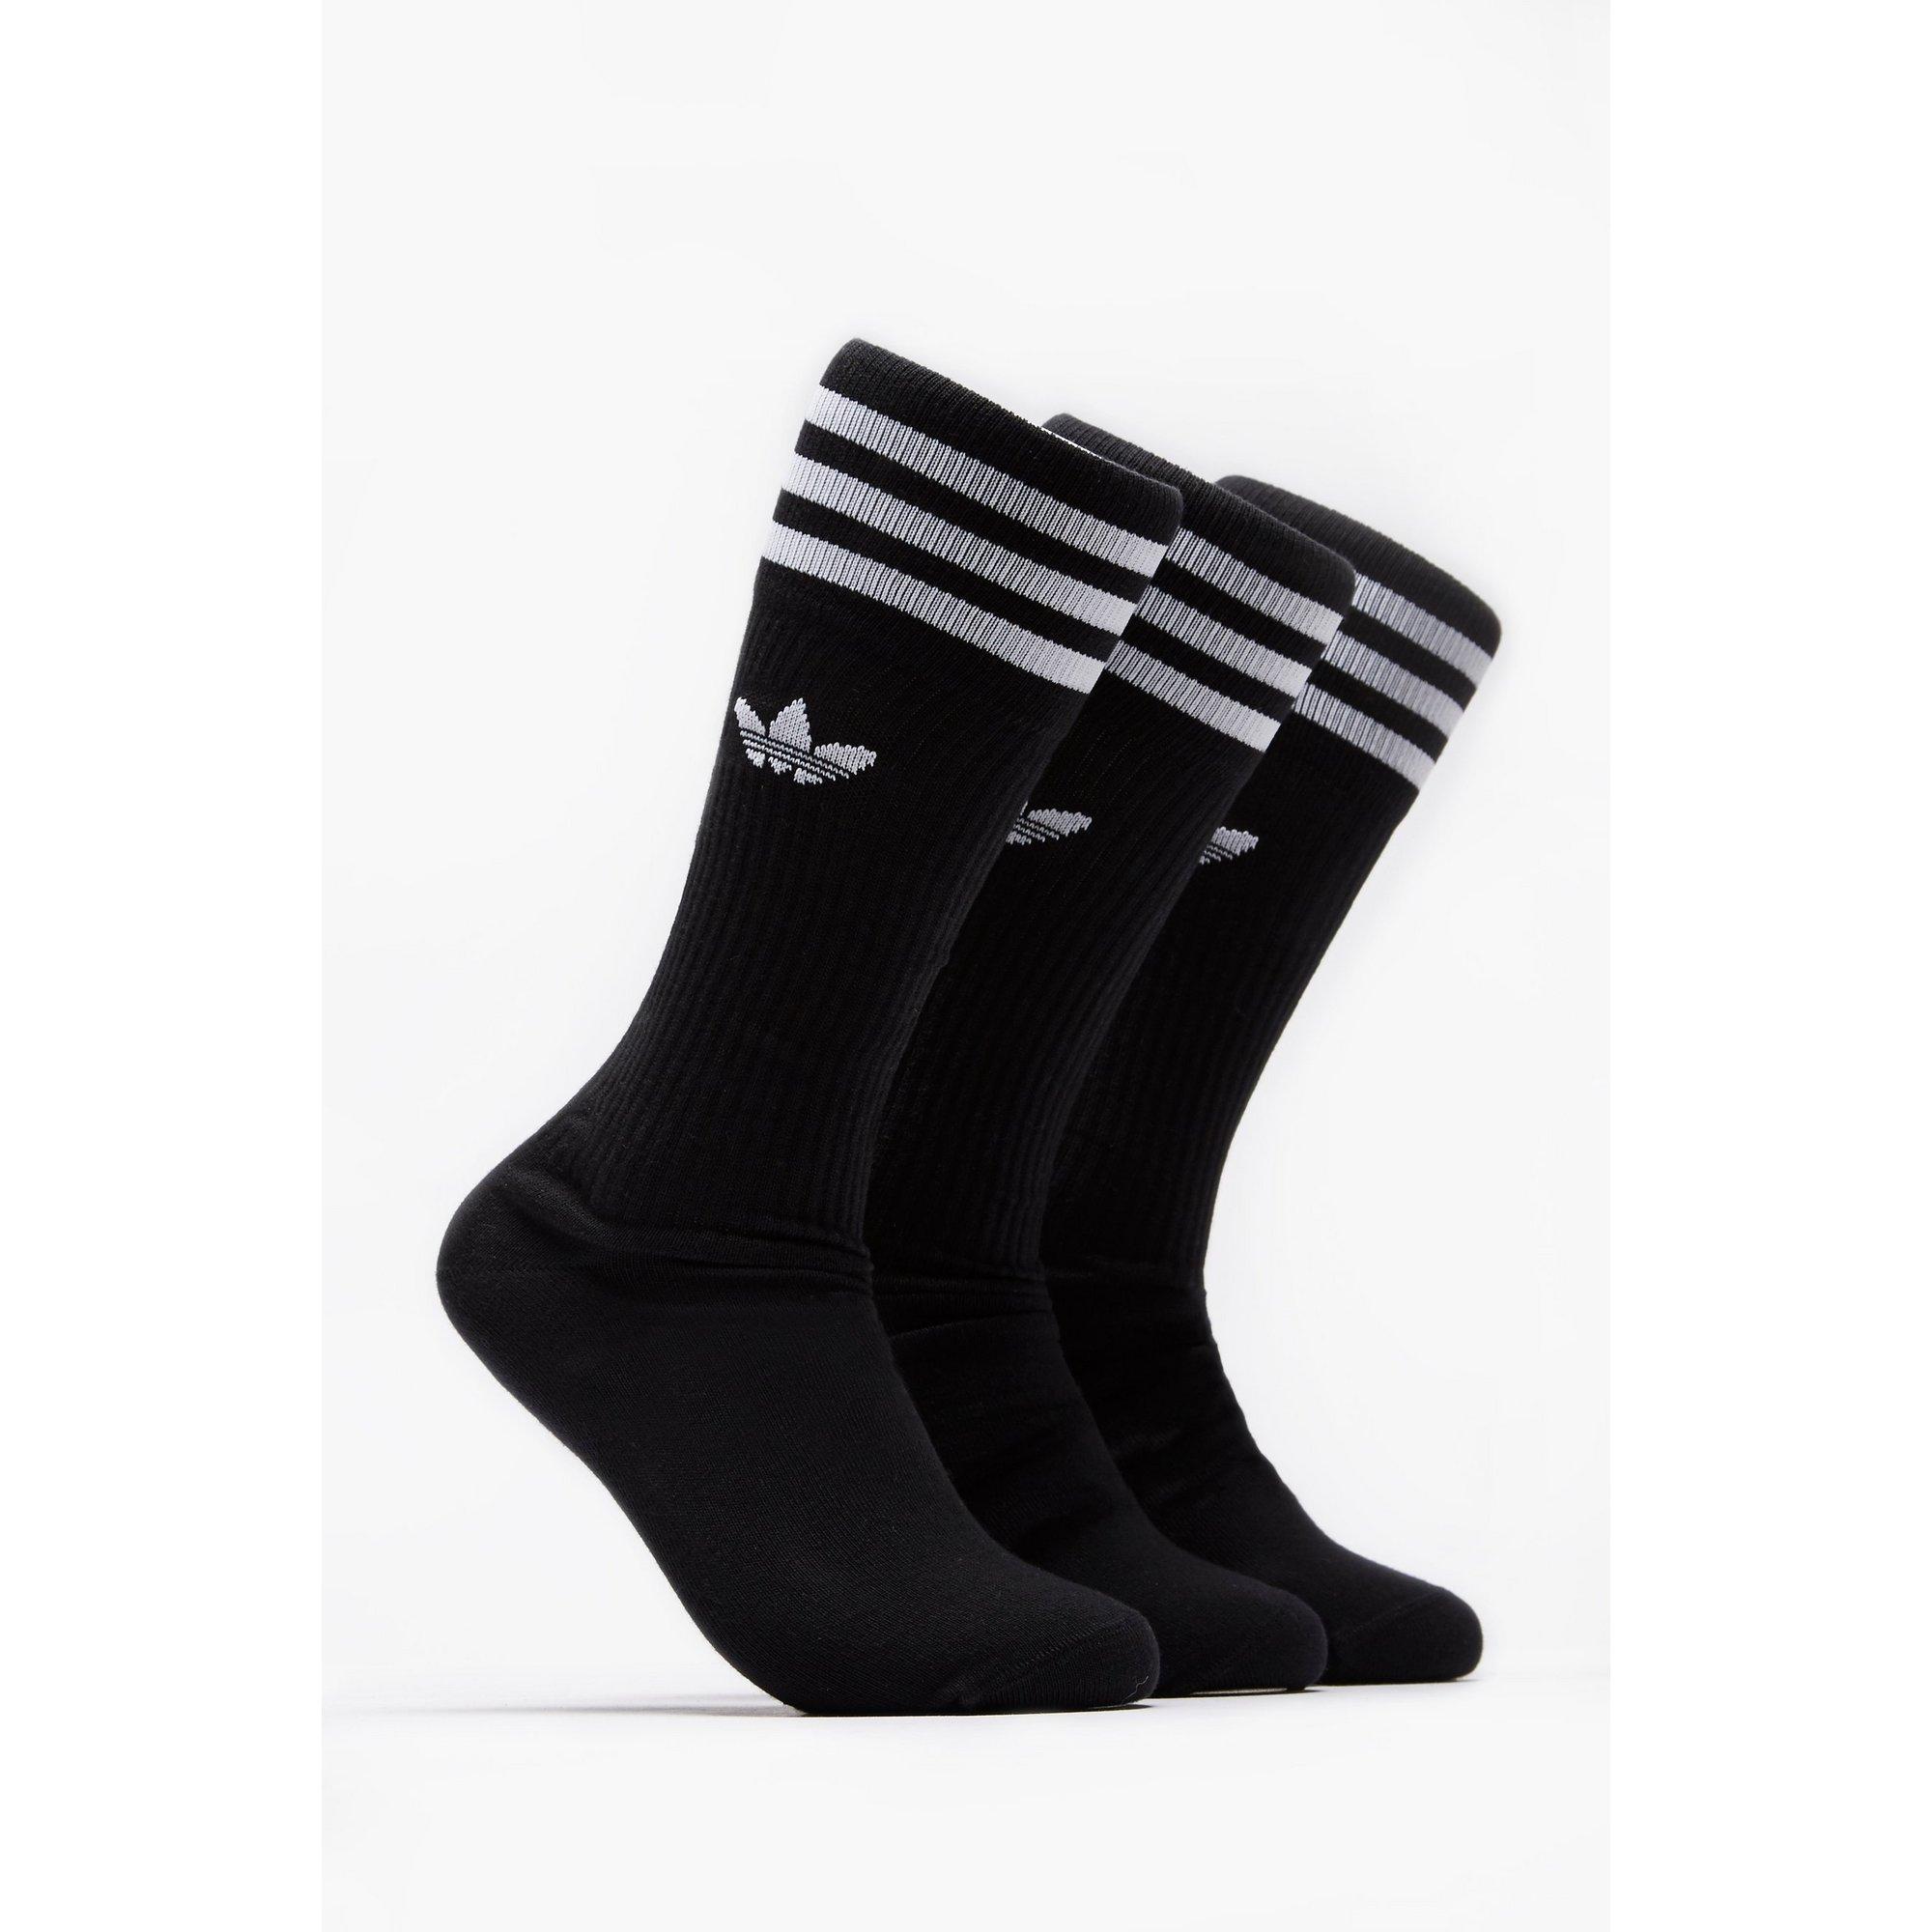 Image of adidas Originals Pack of 3 Crew Socks